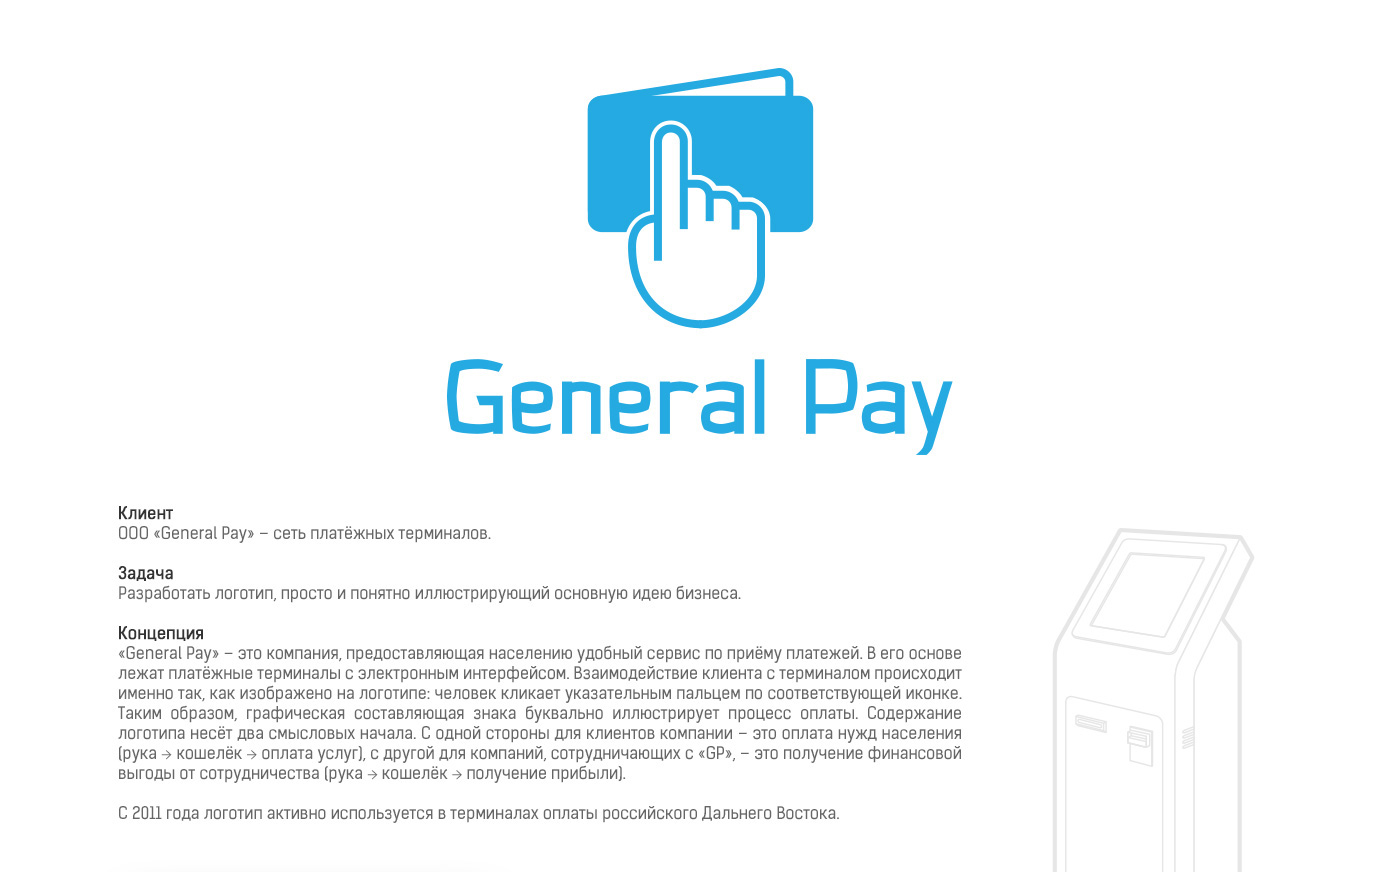 Логотип General Pay